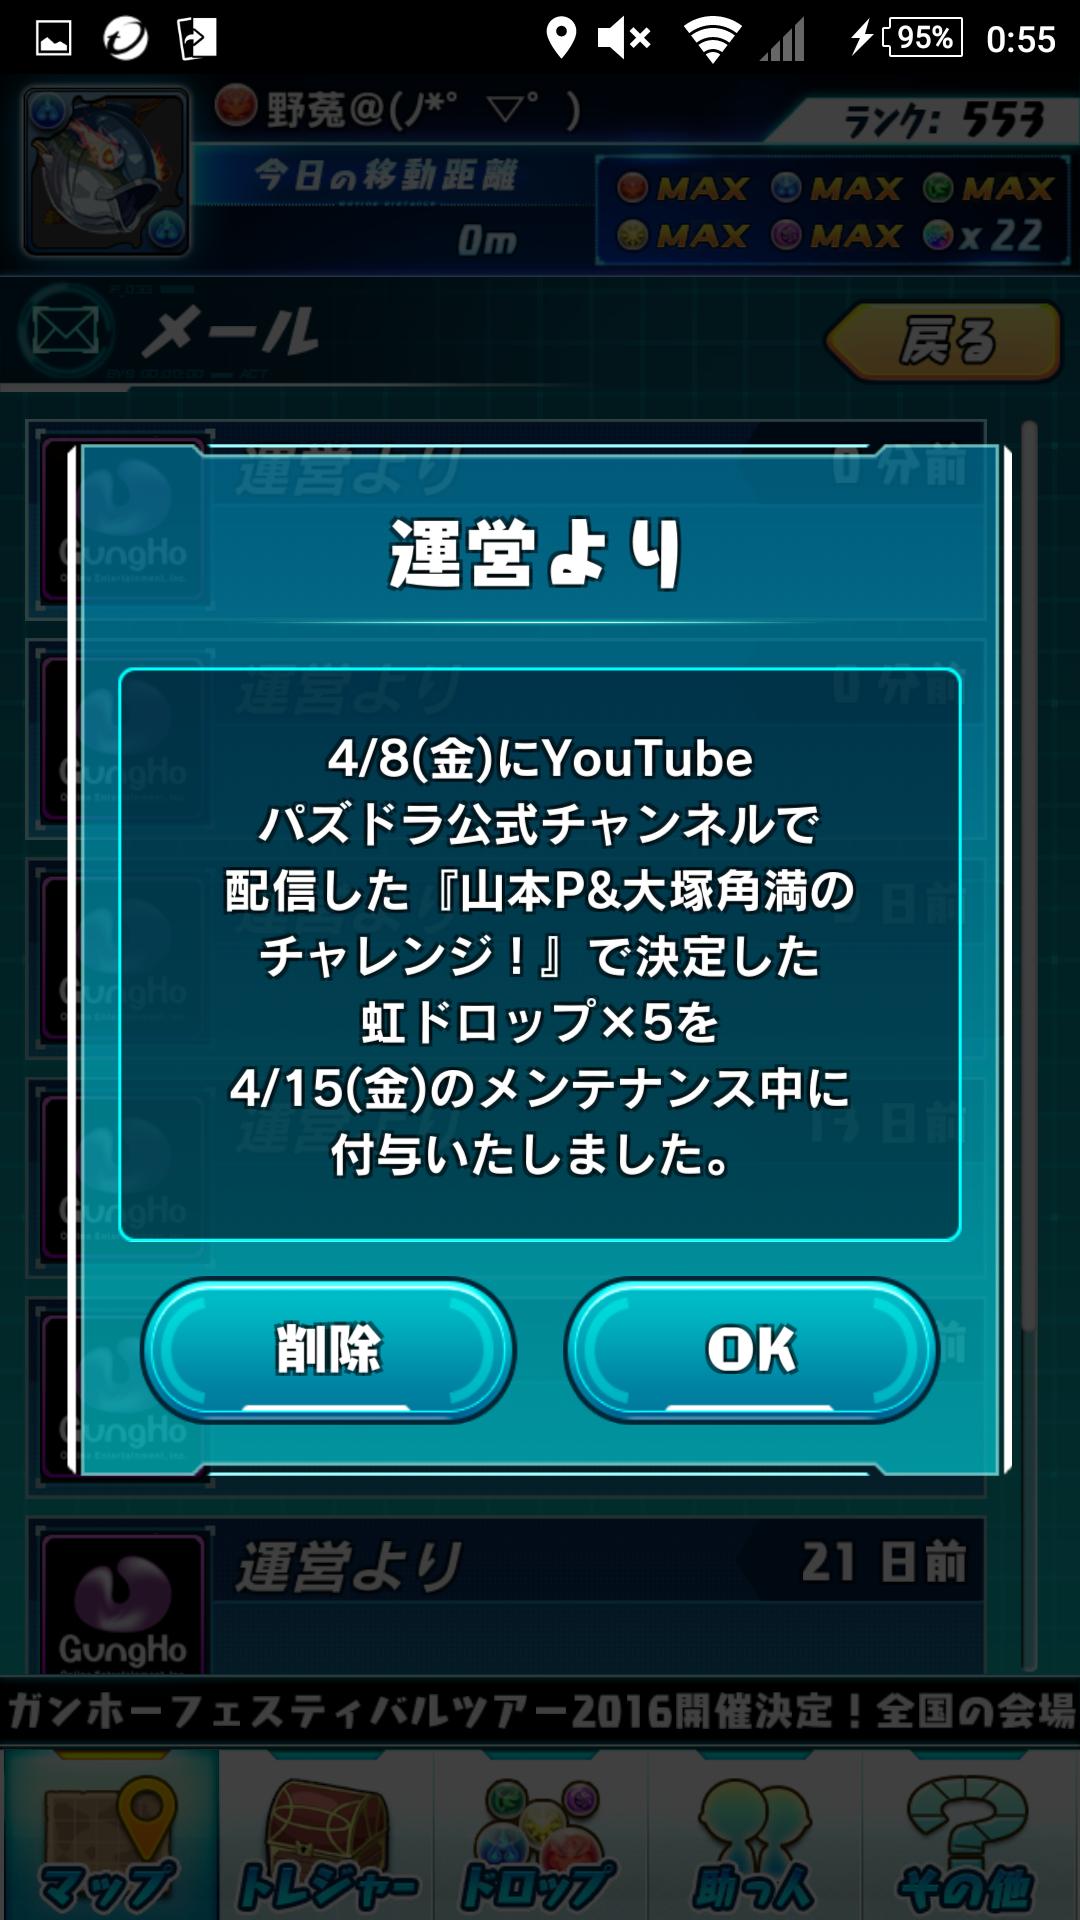 Screenshot_2016-04-17-00-55-53.png